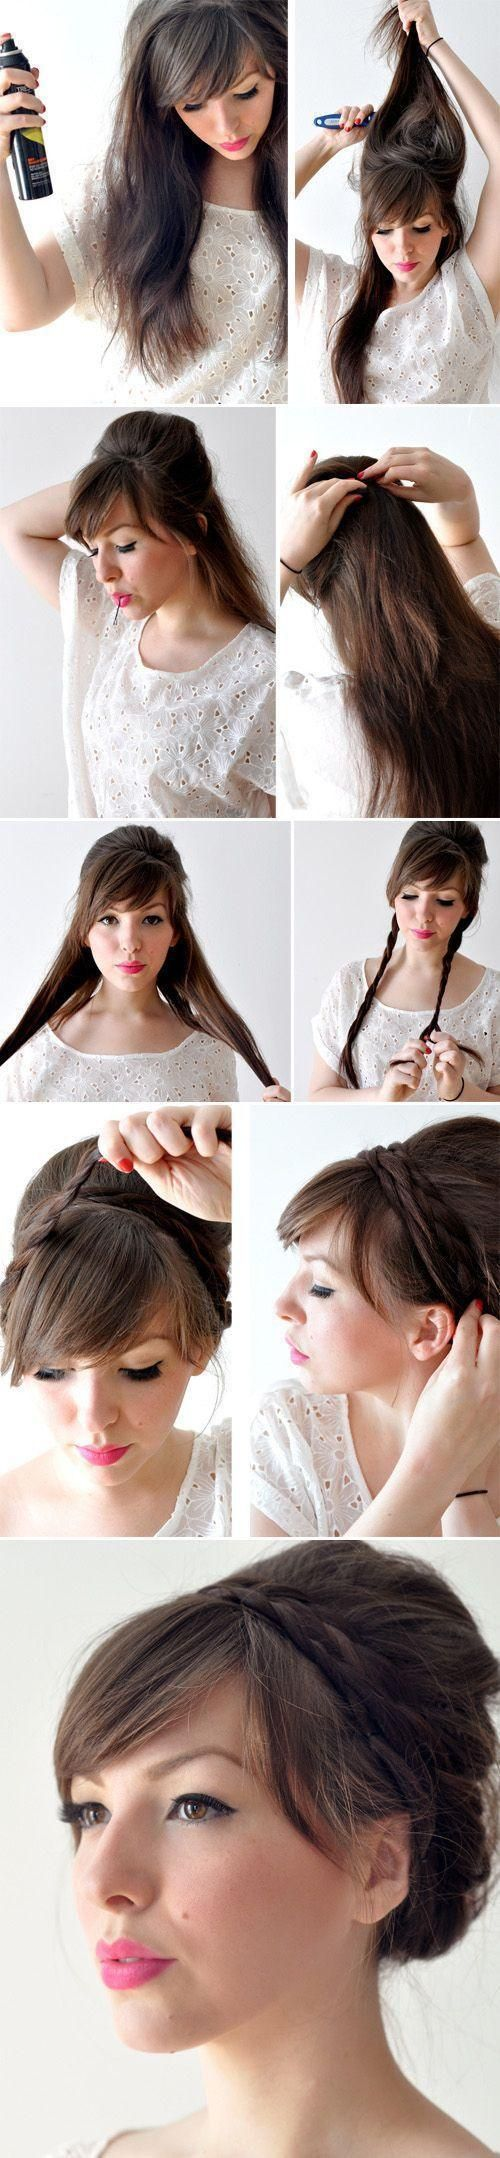 Braid bun cabelos uc pinterest hair style easy and updo